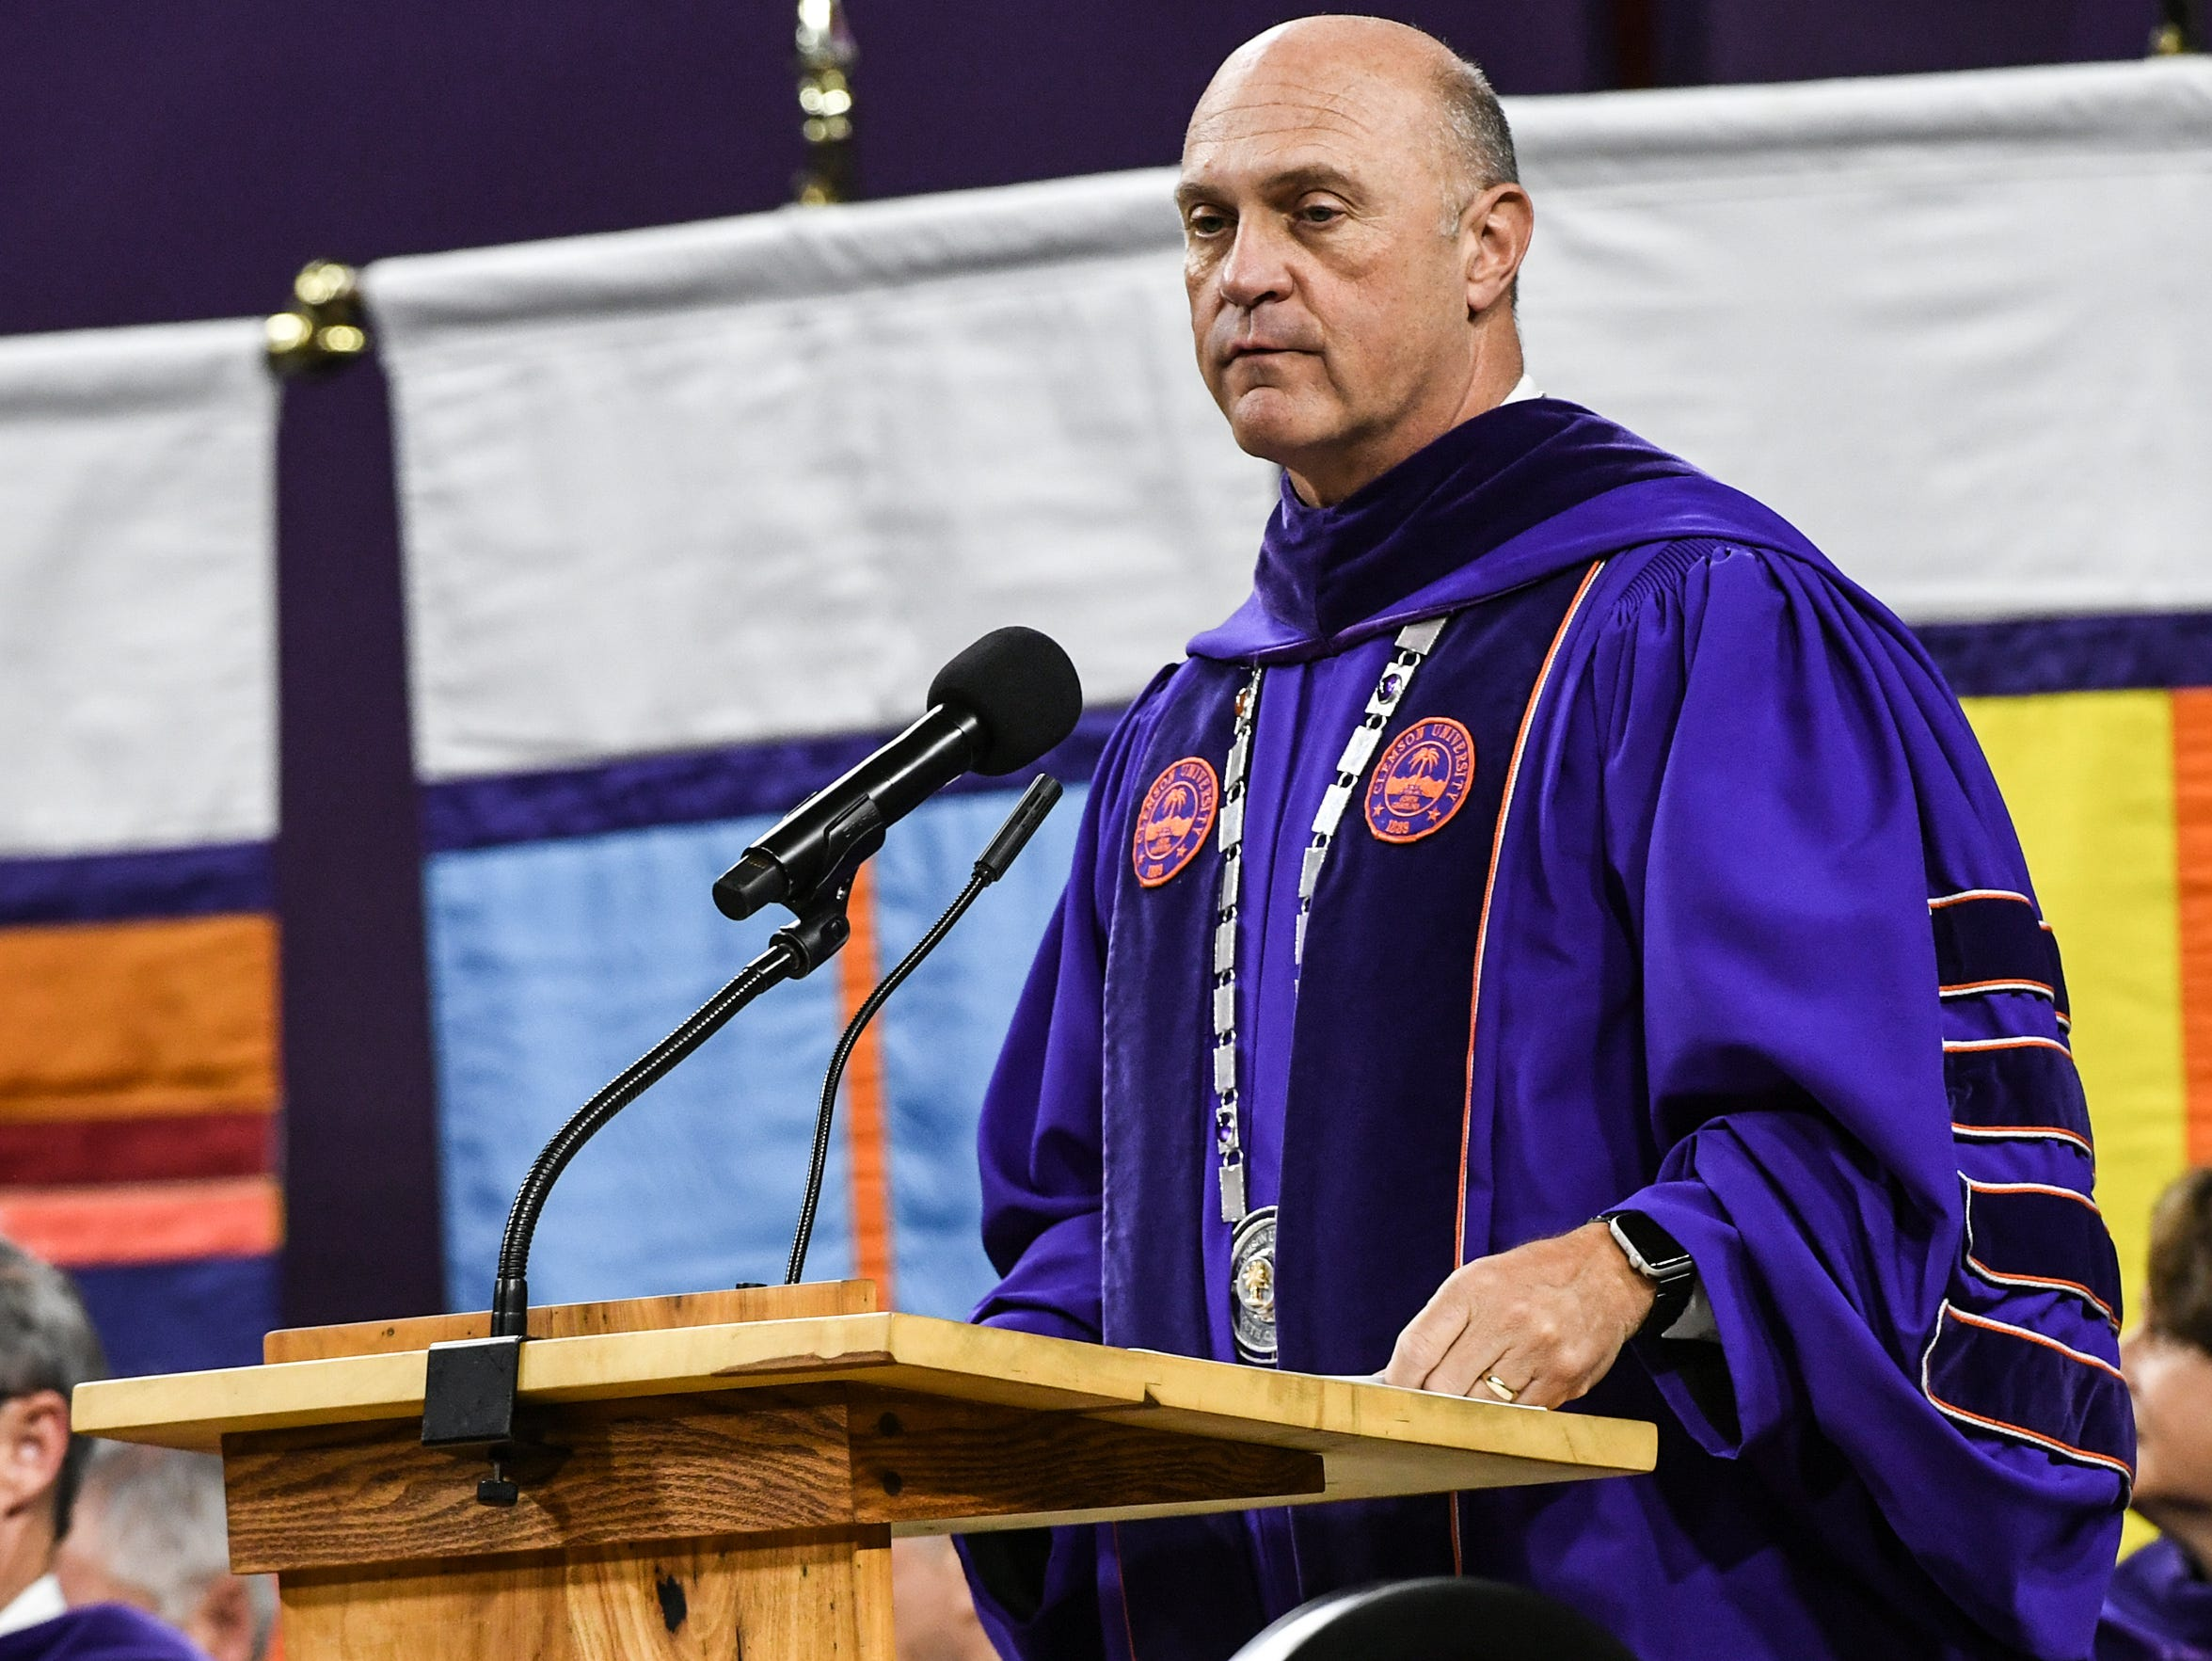 President Jim Clements speaks during Clemson University commencement ceremonies in Littlejohn Coliseum in Clemson Friday, May 10, 2019.